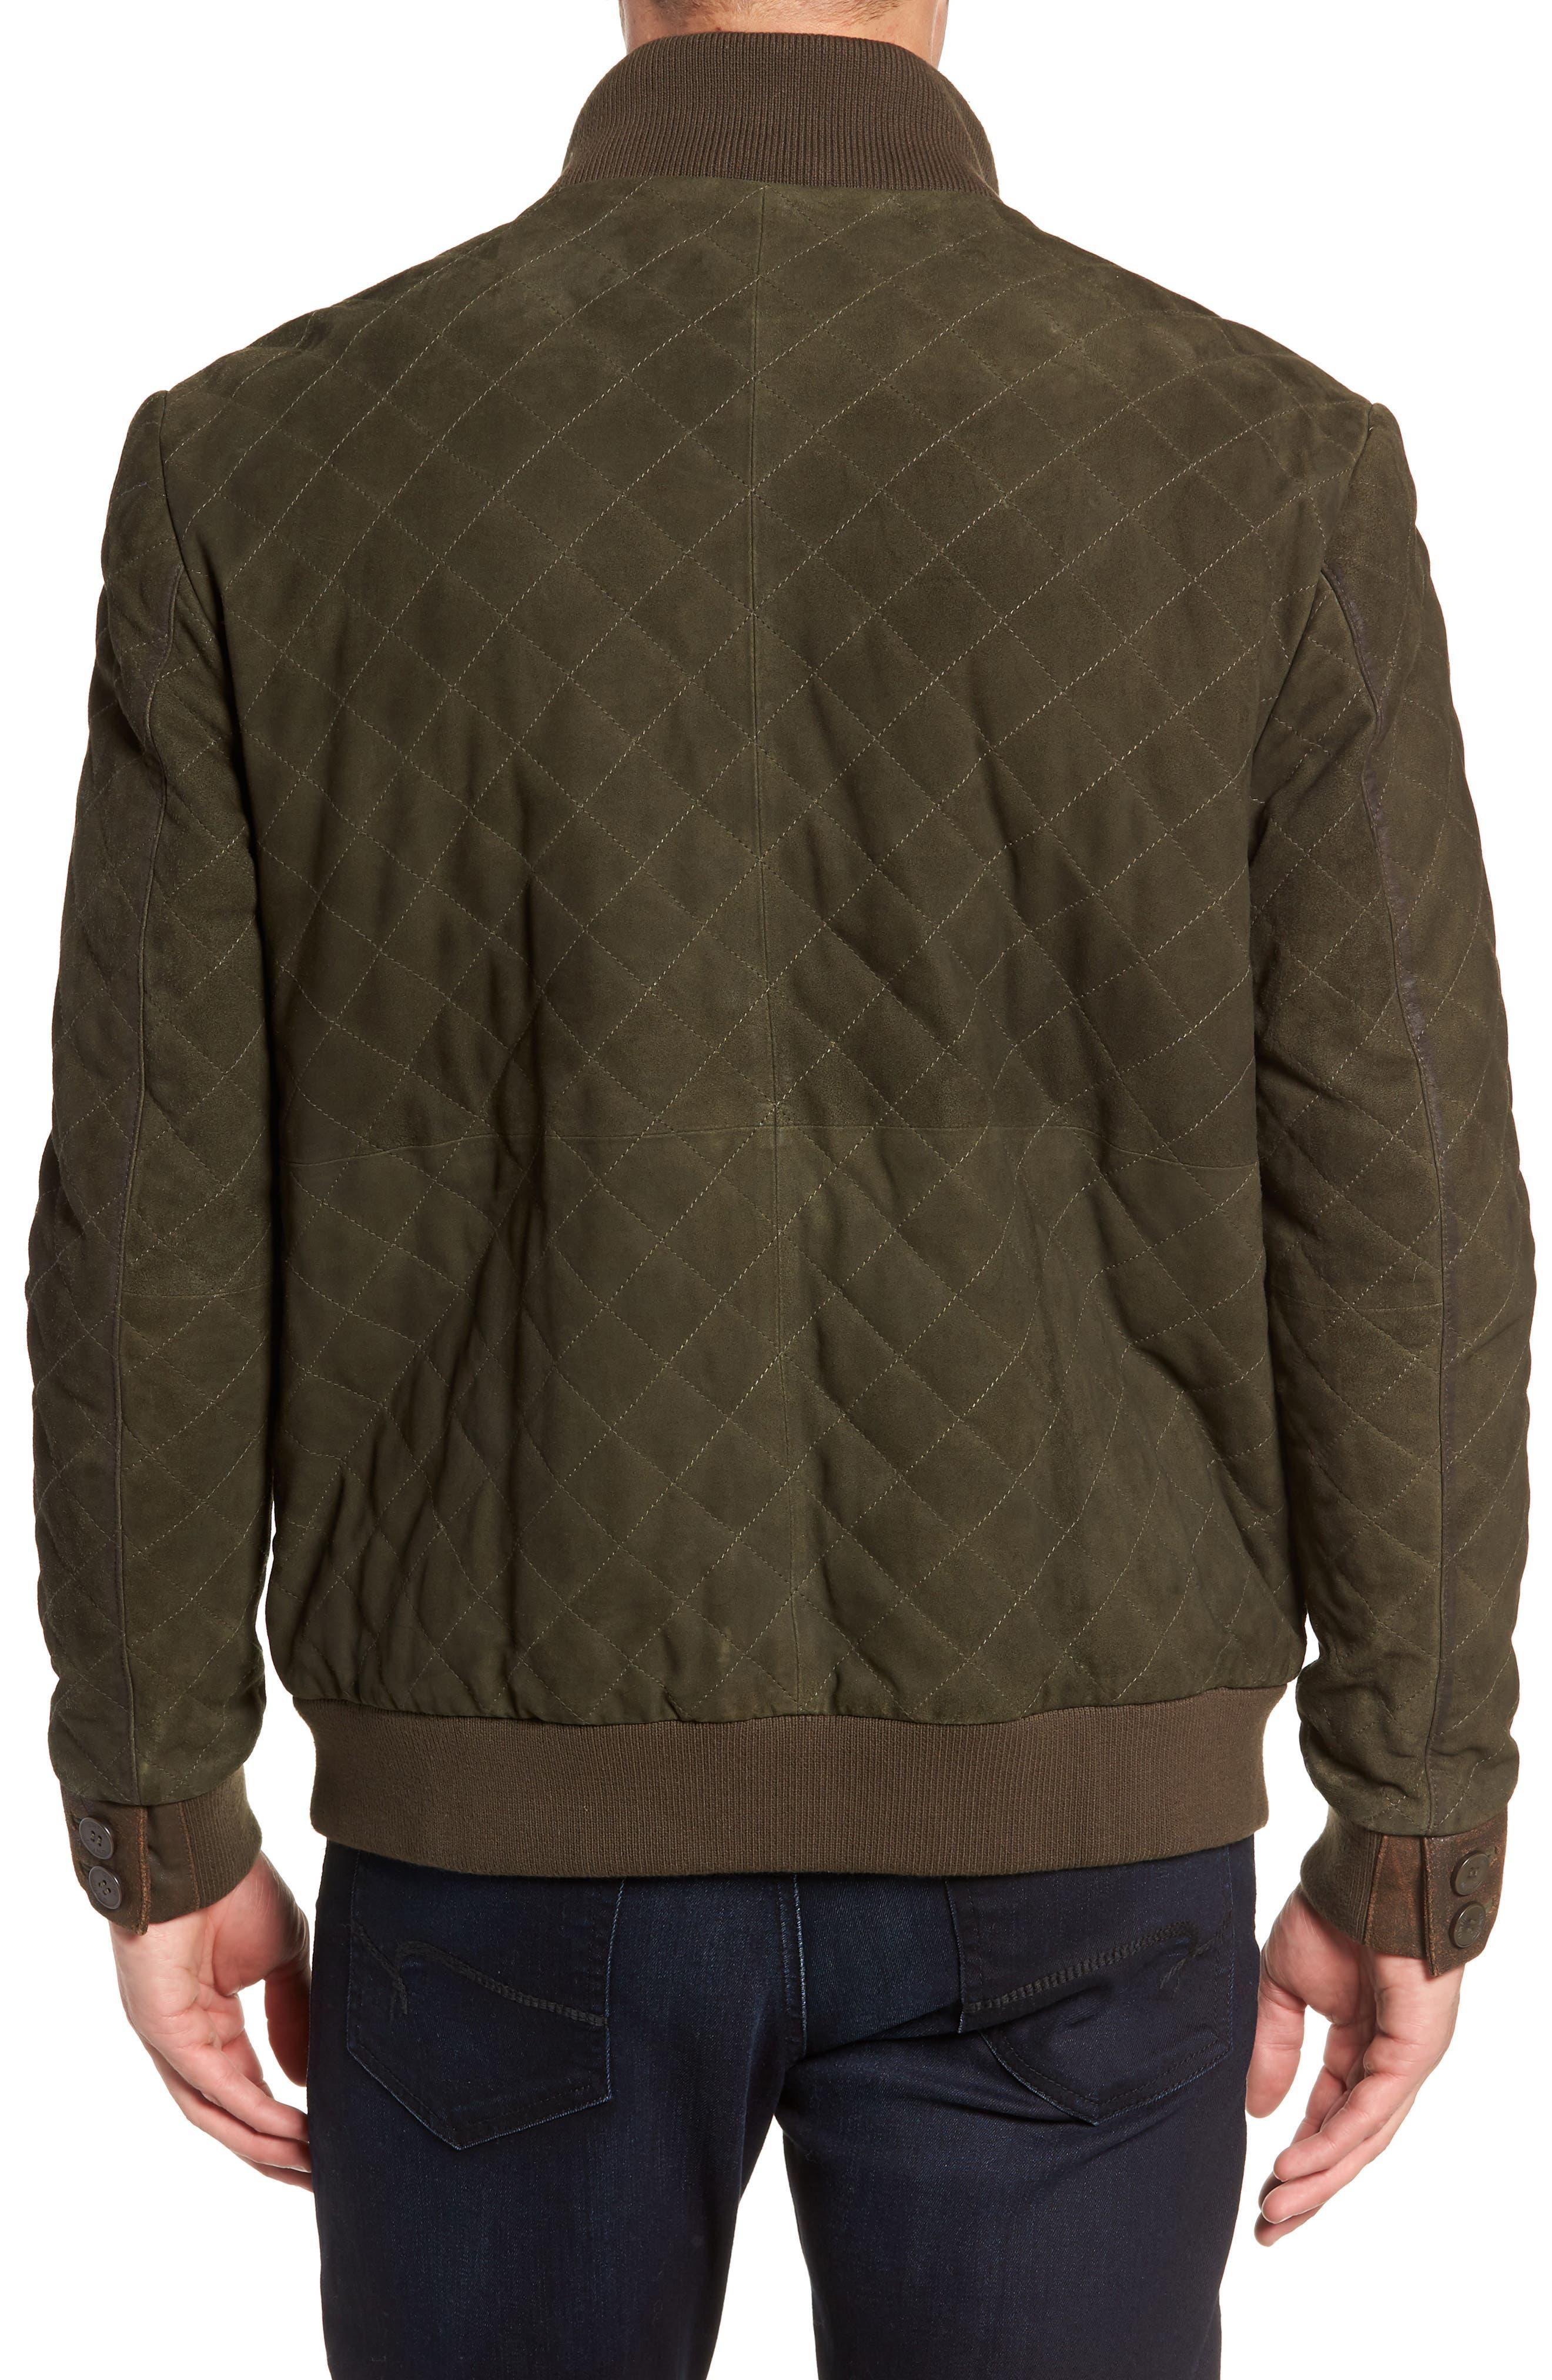 Regular Fit Quilted Suede Jacket,                             Alternate thumbnail 2, color,                             OLIVE